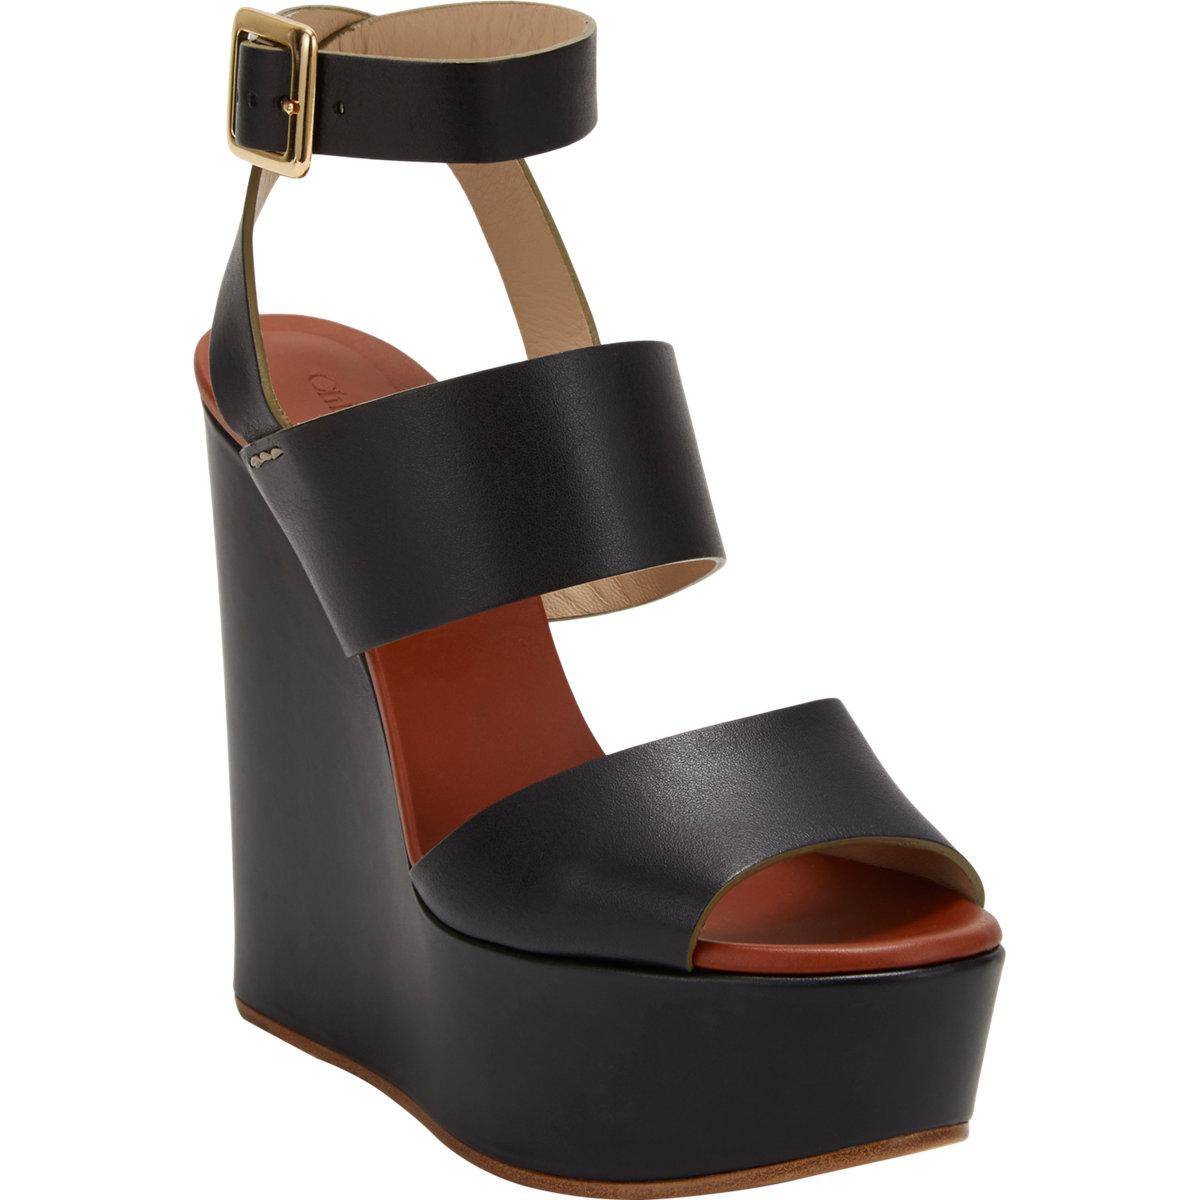 Chloé Platform Wedge Sandals online cheap authentic free shipping 2014 unisex xjxfcow